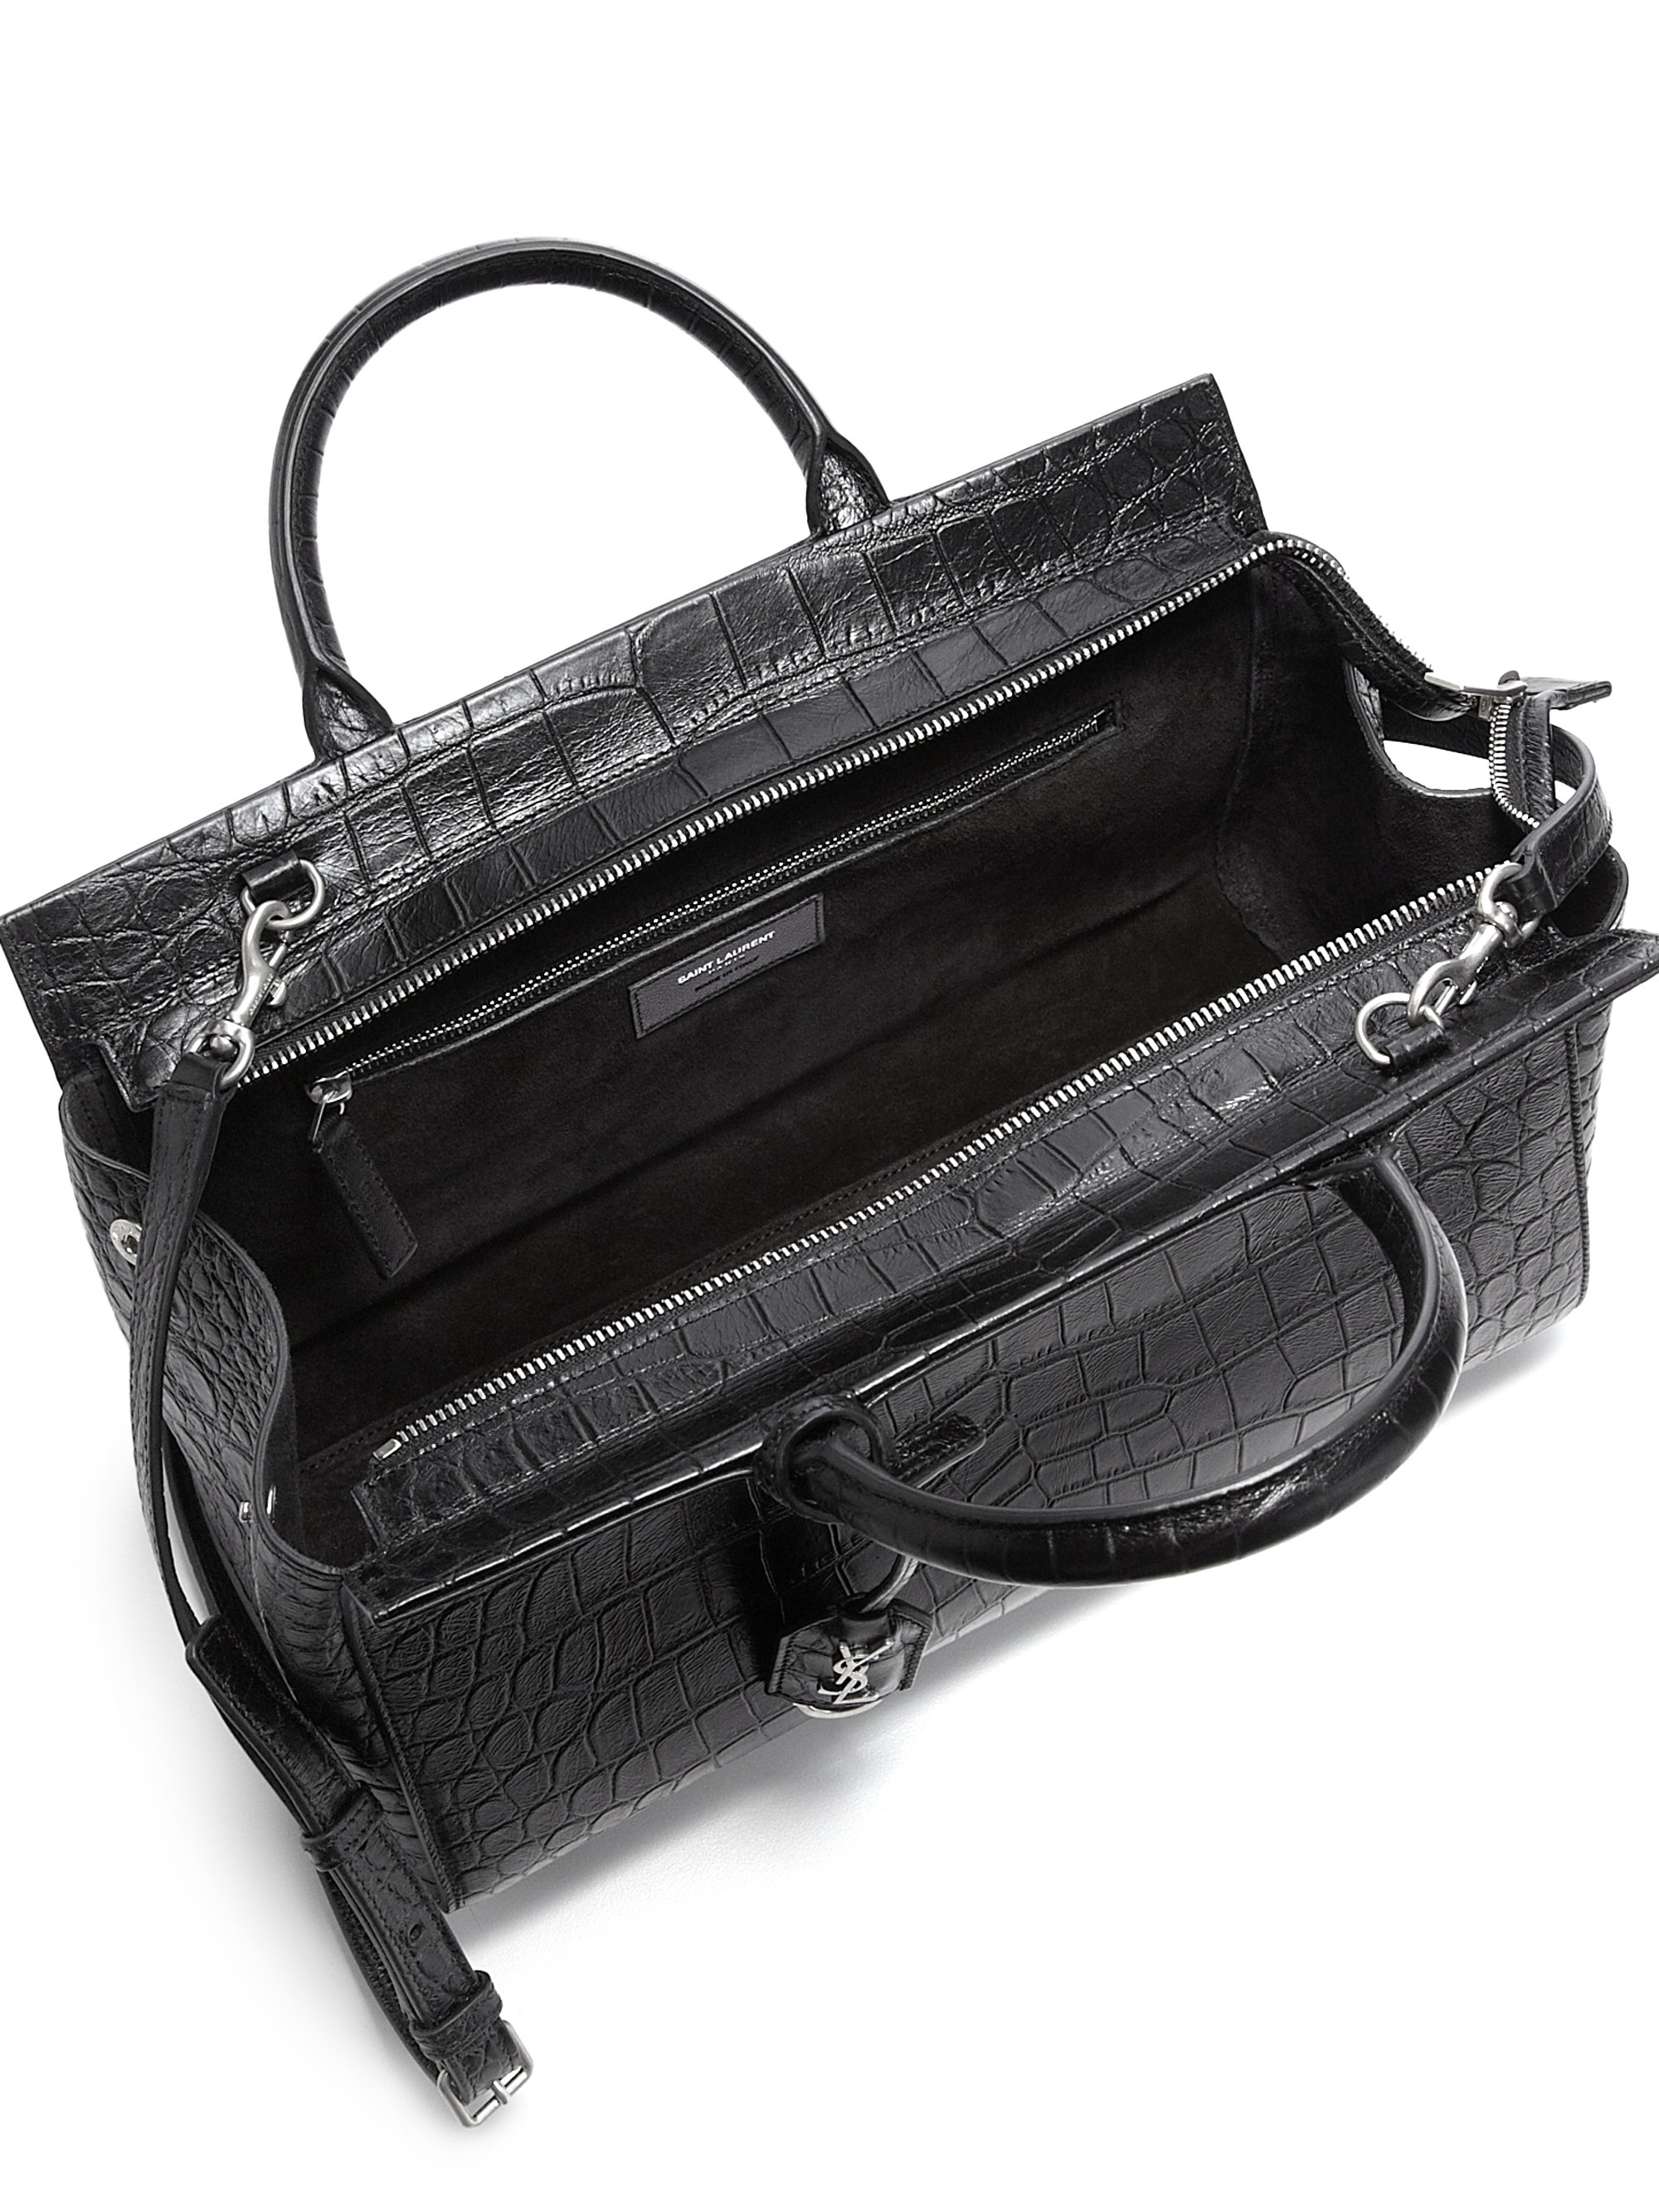 yves saint laurent looks - monogram small zip-around satchel bag, gray